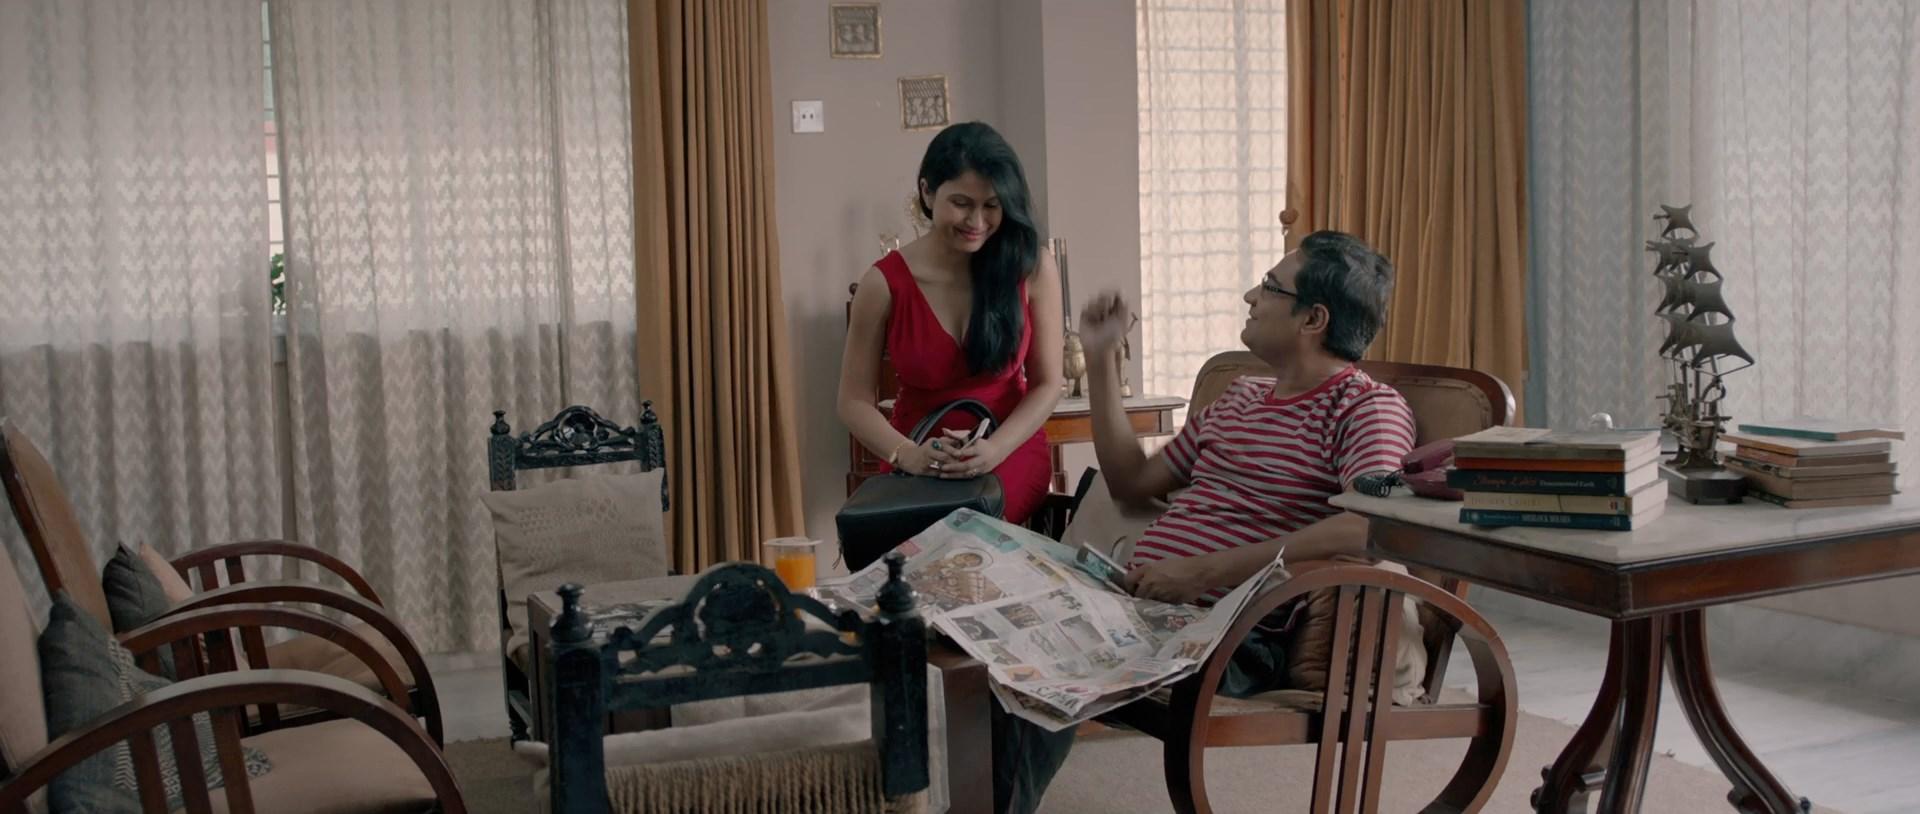 KAYA The Mystery Unfolds 2021 Bengali Movie 1080p WEB DL x264 AAC.mp4 snapshot 00.05.36.875